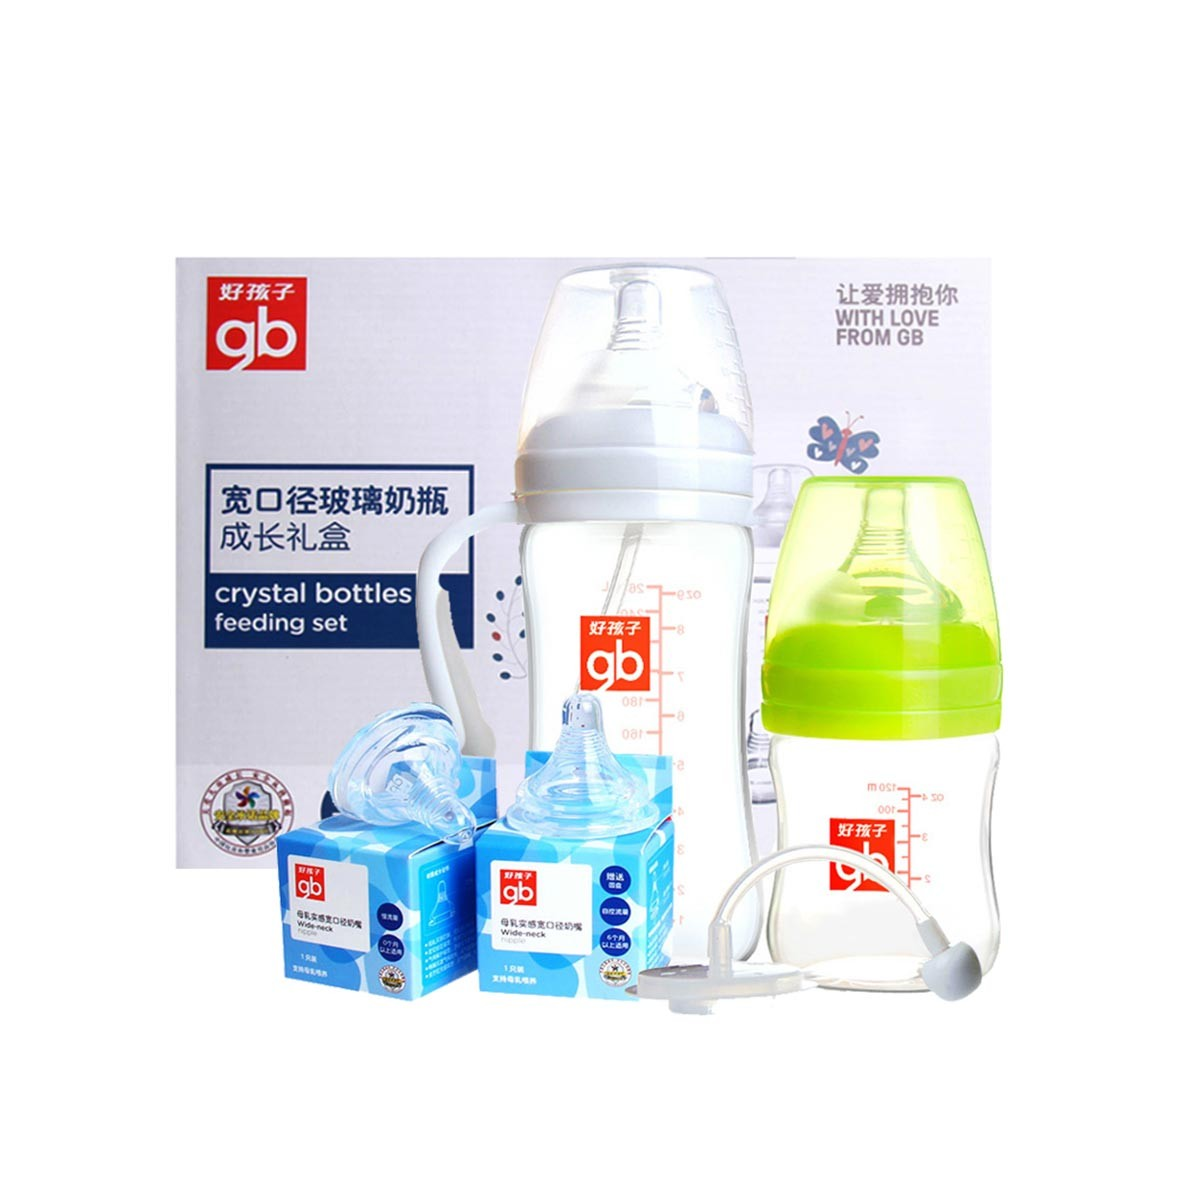 GoodBaby好孩子 新生婴儿宽口径奶瓶礼盒套装120ml奶瓶+260ml奶瓶+2个奶嘴+宽口径导管组 玻璃防胀气 P80035